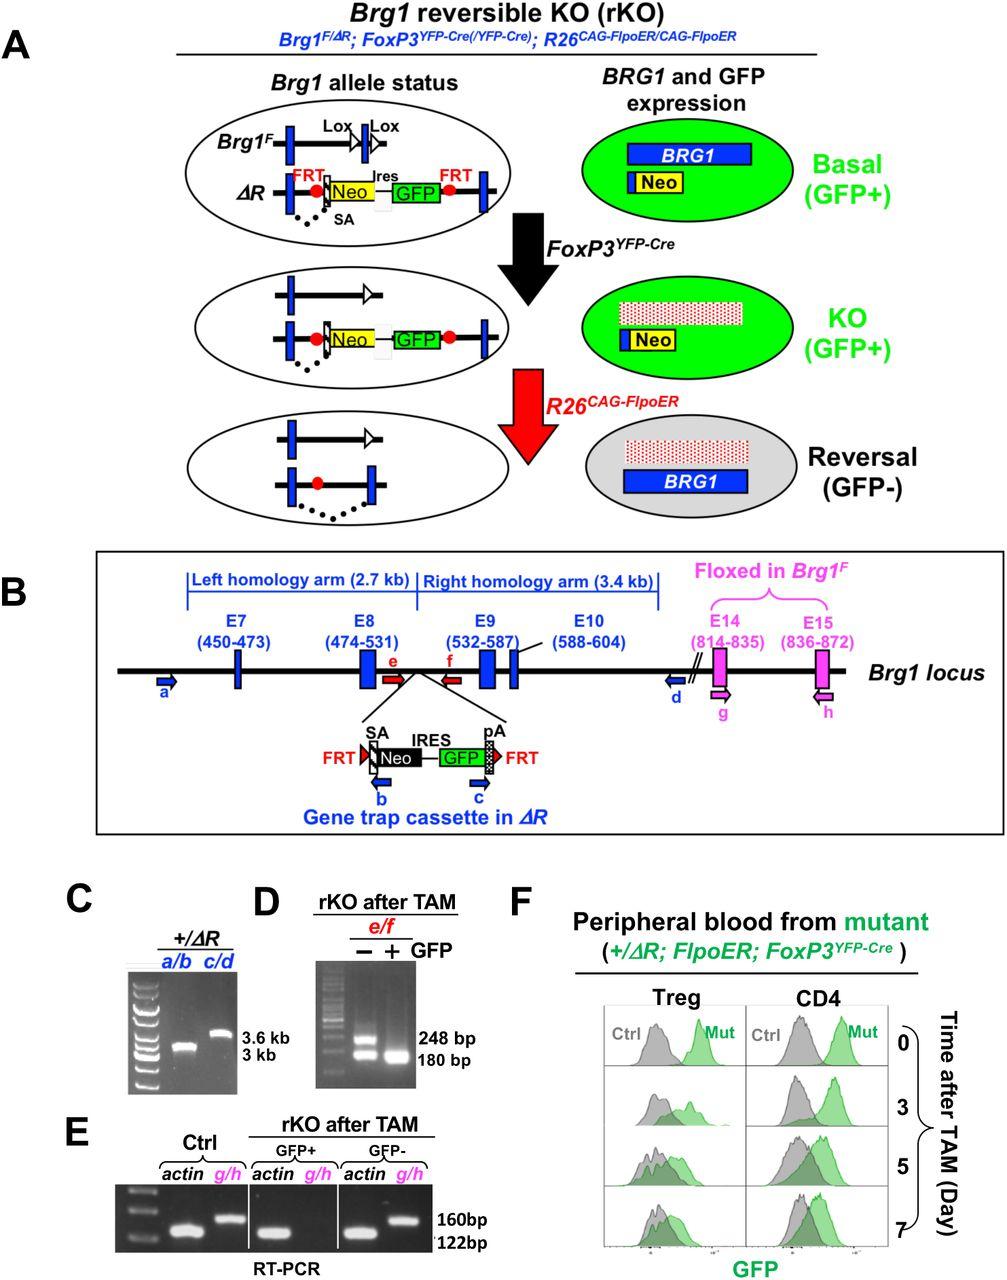 A reversible KO model reveals therapeutic potentials of